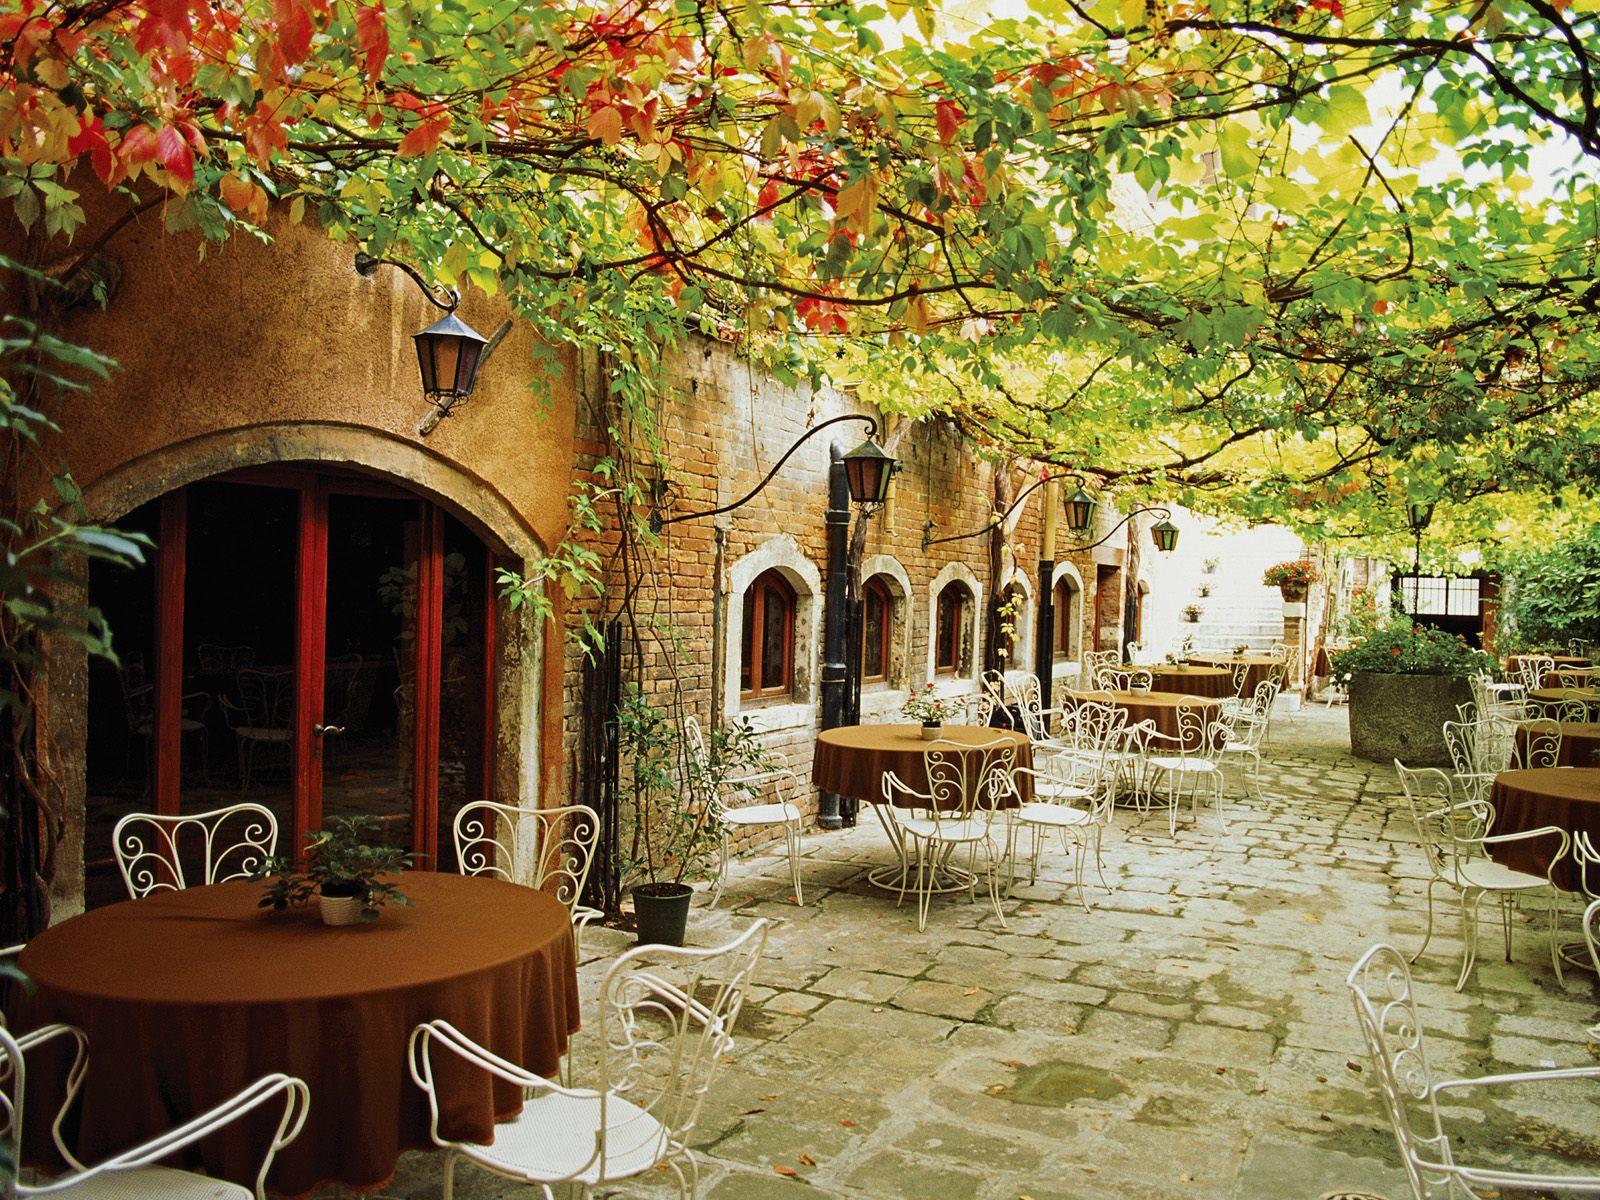 http://1.bp.blogspot.com/-m63n6vH6ZFQ/Tcp3ZDnBUiI/AAAAAAAACW4/PfUmUYgpvaA/s1600/Dining+Alfresco%252C+Venice%252C+Italy.jpg